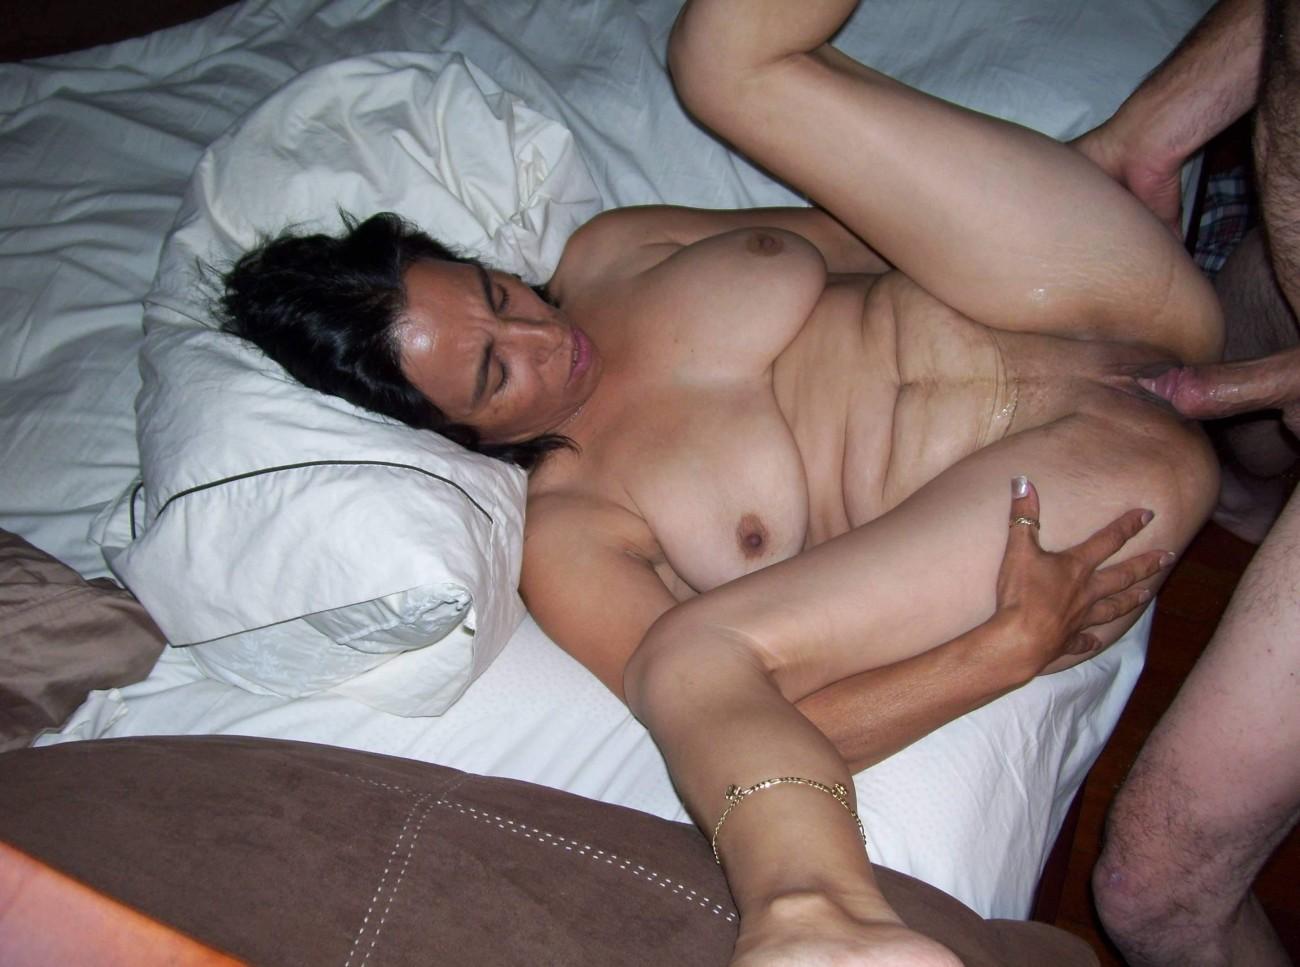 Xxx Amateur Pics, Free Newbie Porn Galery, Sexy Homemade Clips